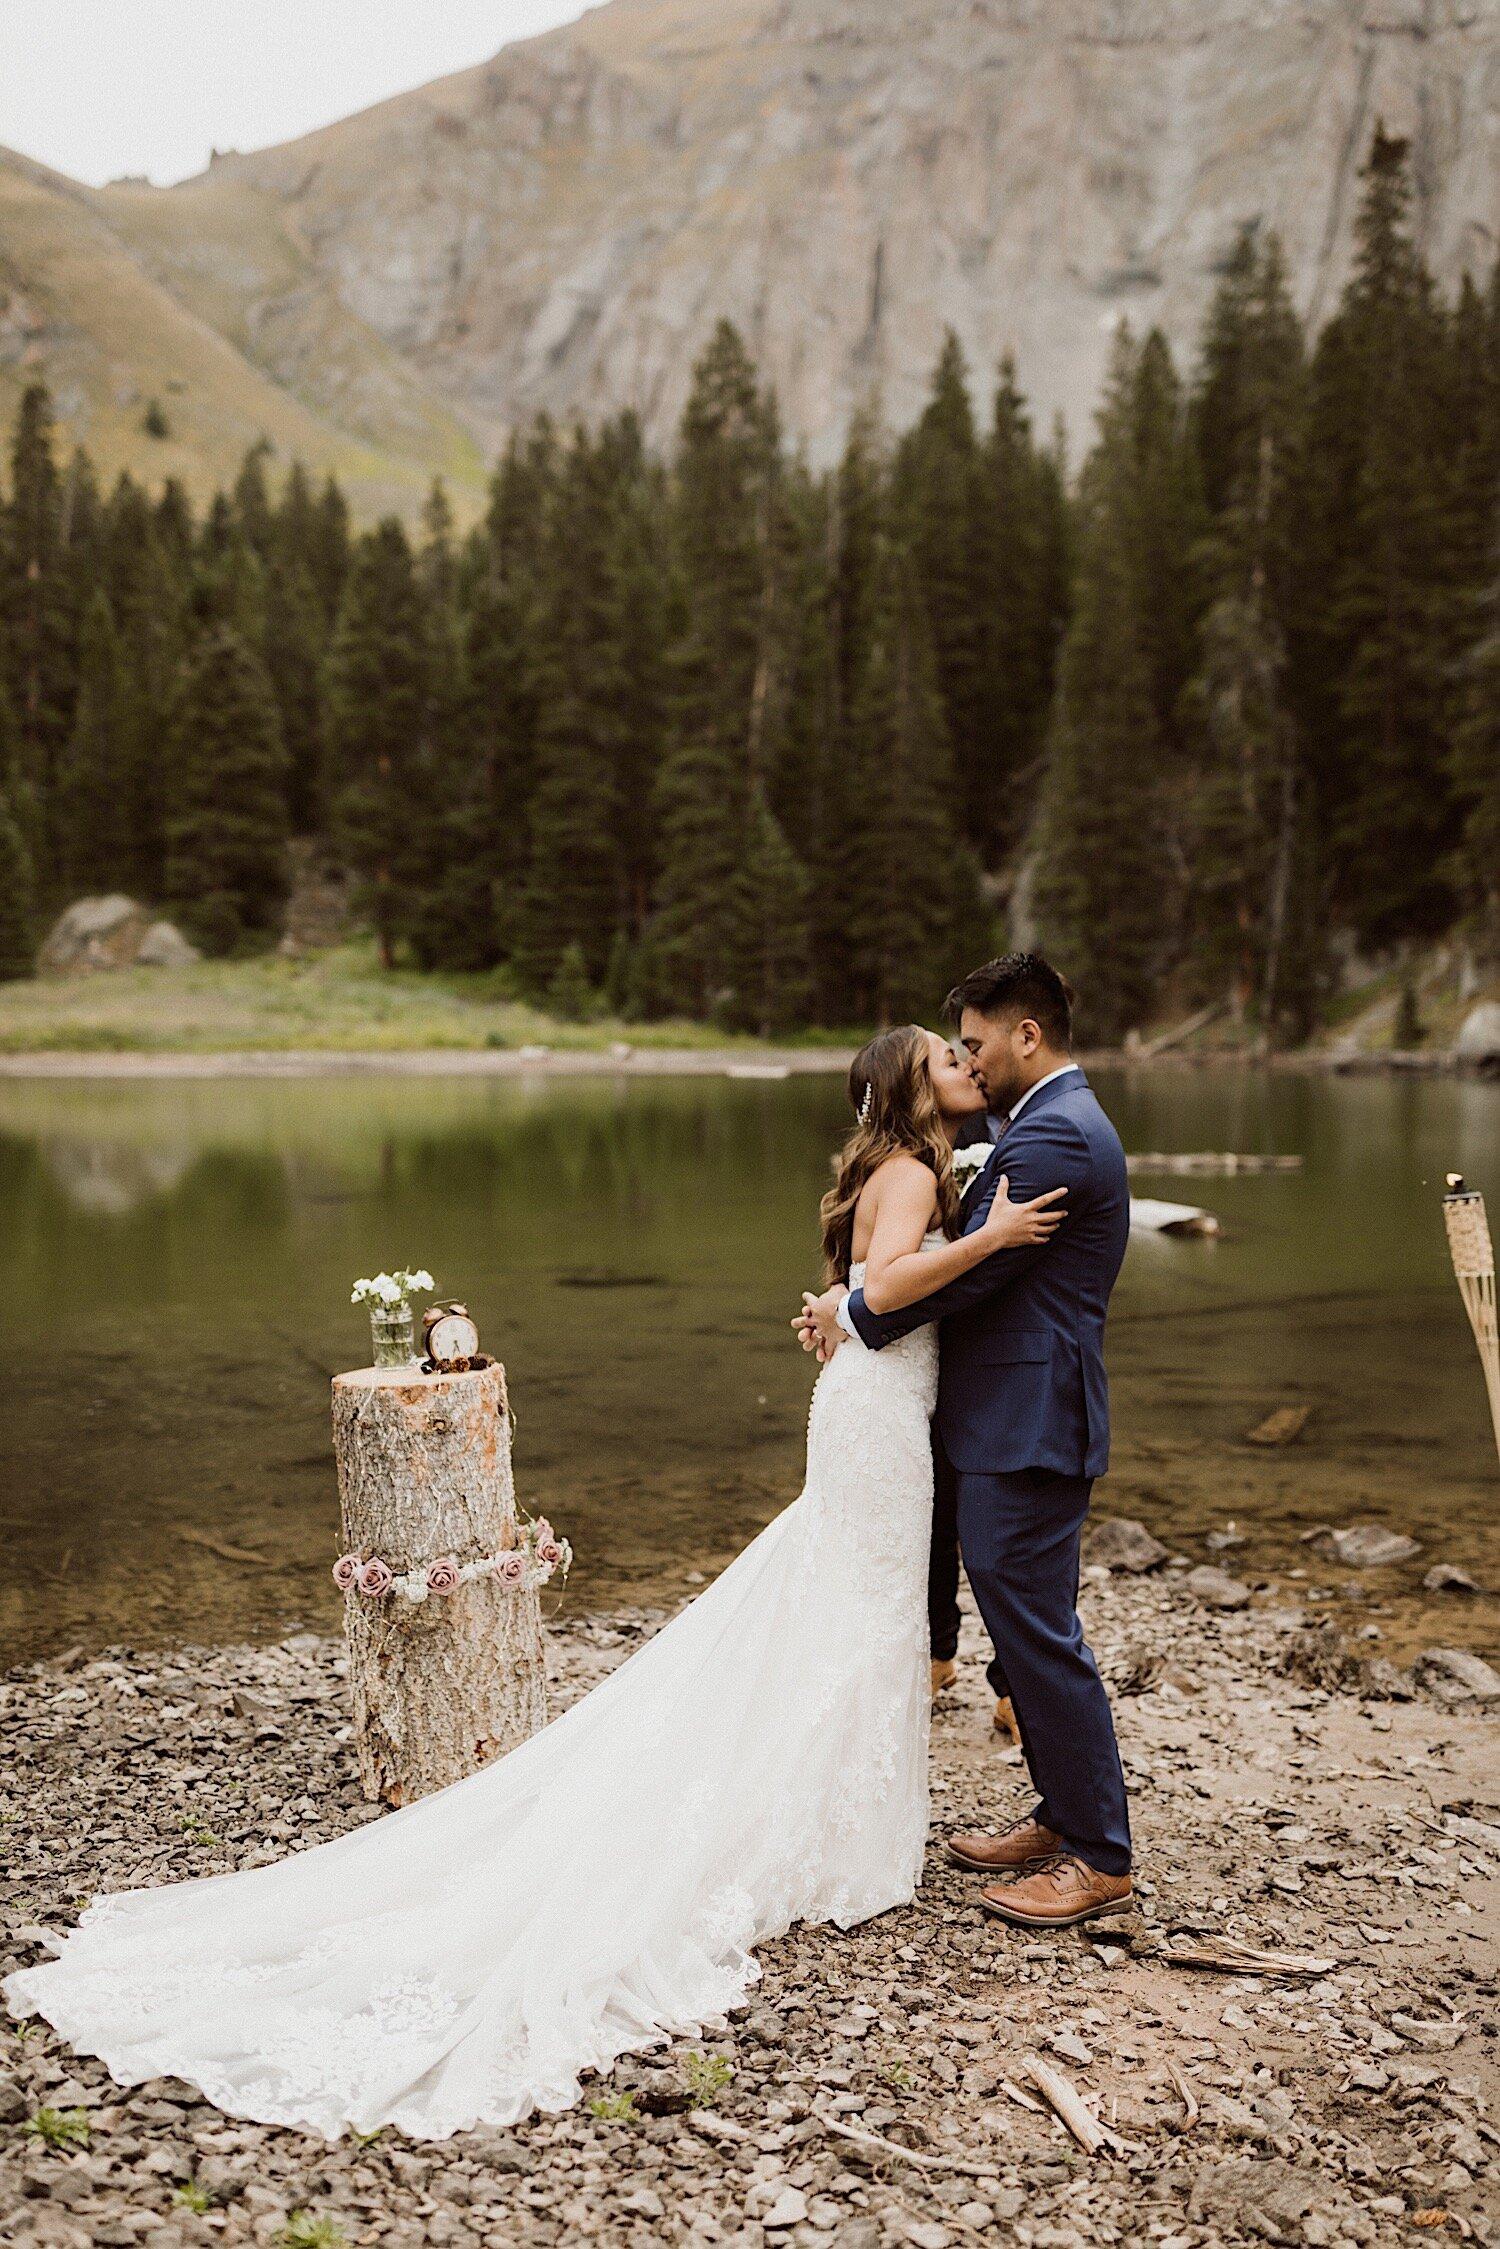 10_intimate-wedding-telluride-colorado-16.jpg